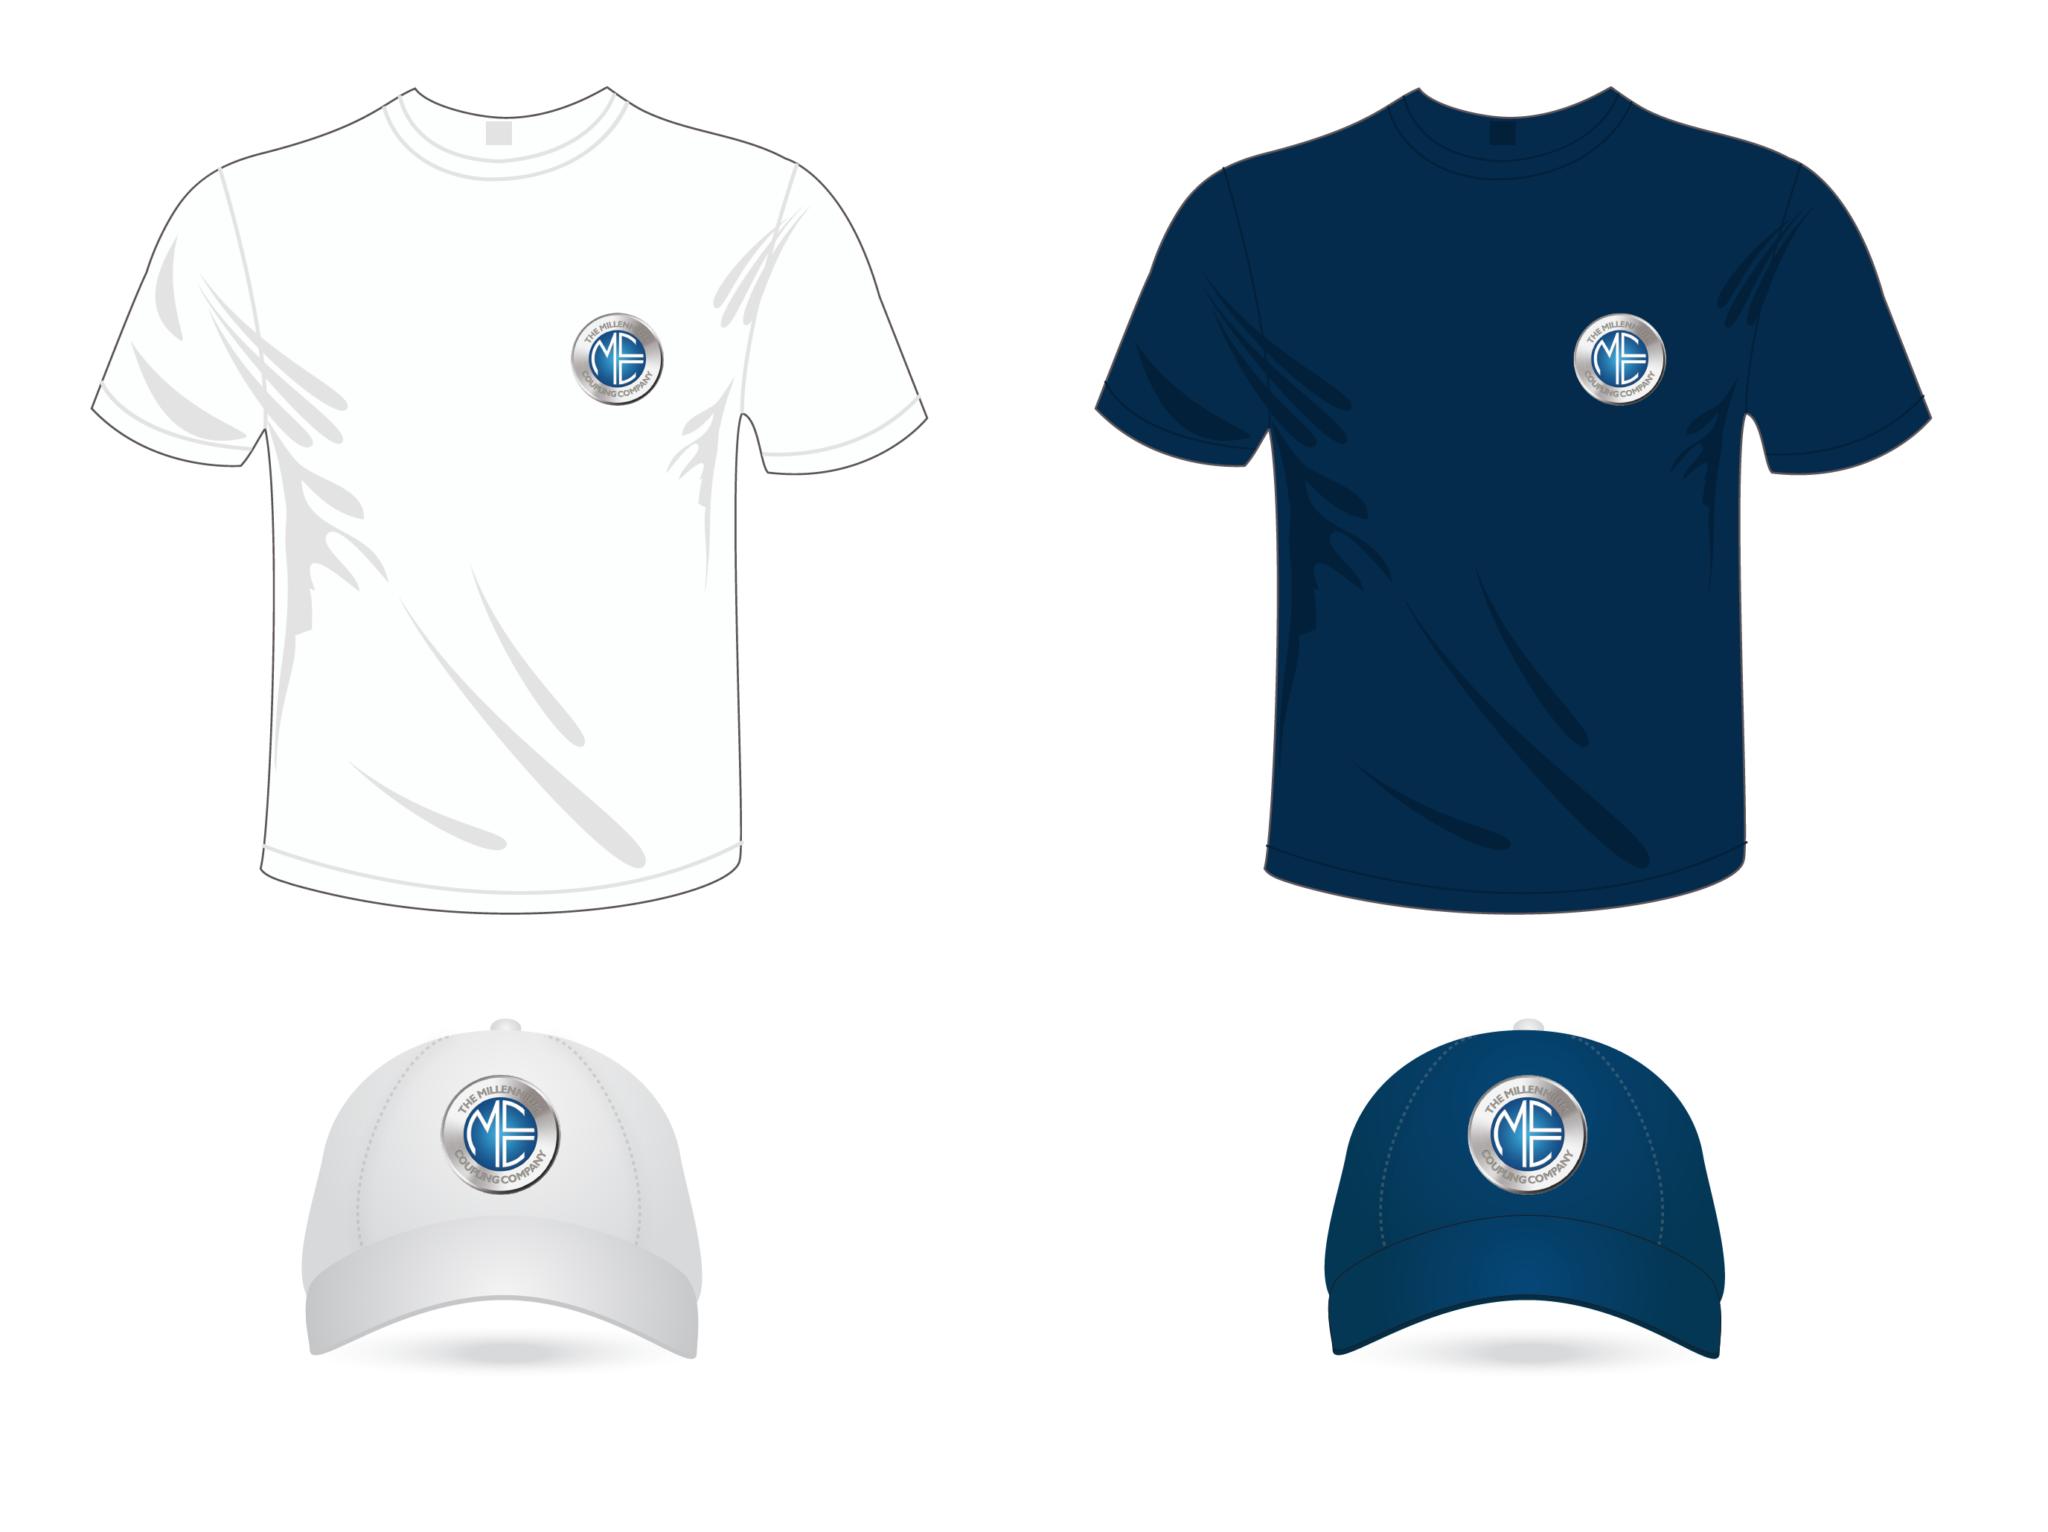 Tee-shirts-caps-Millenium-Coupling-Company